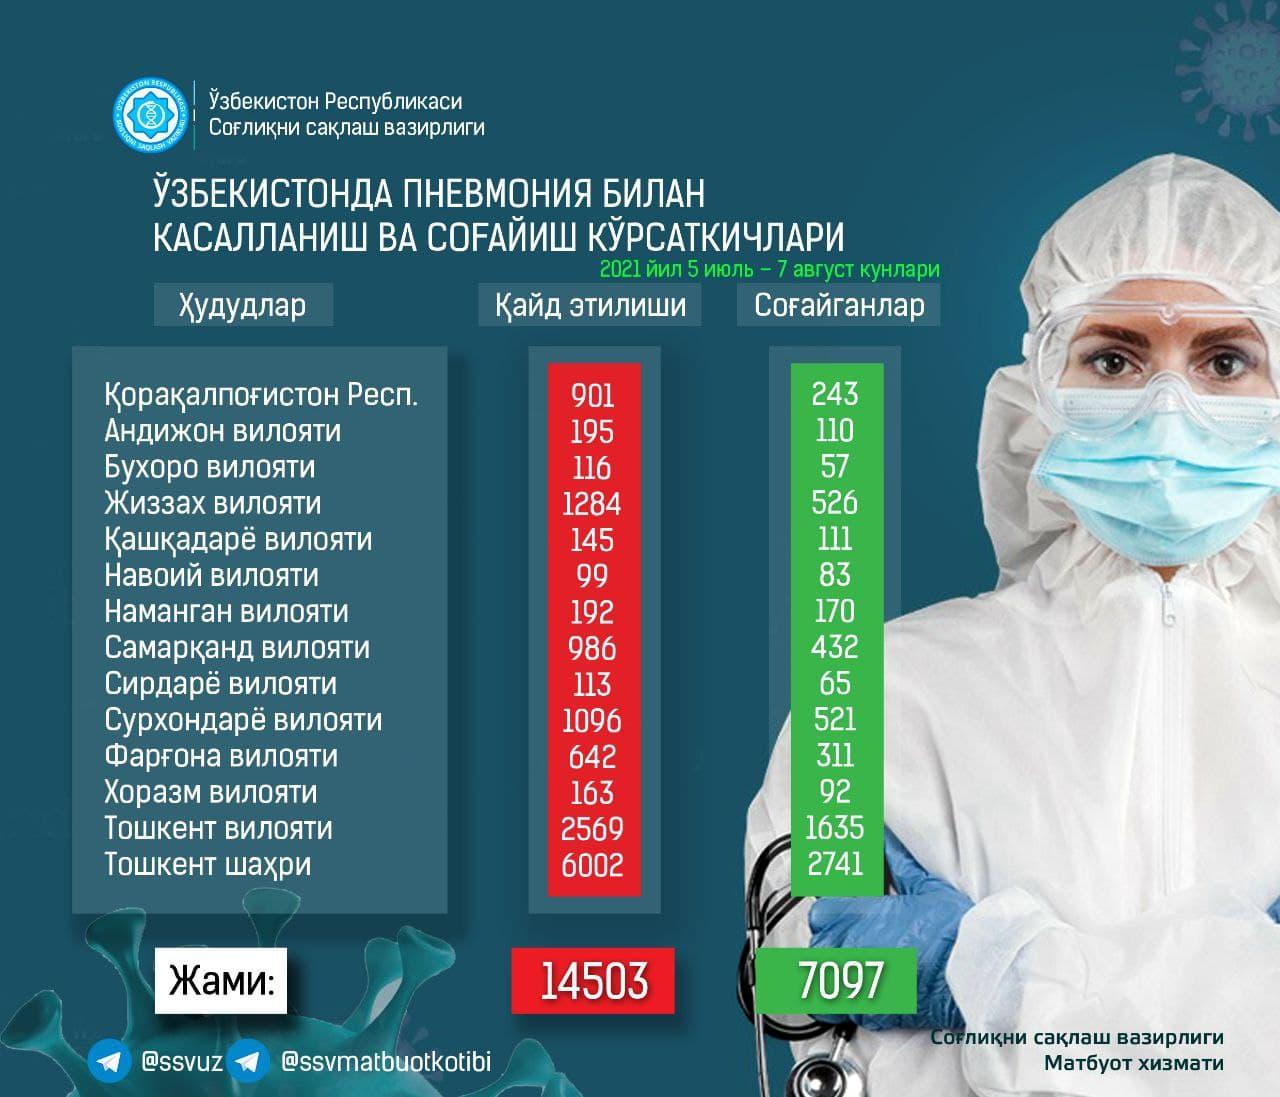 У почти полтысячи узбекистанцев за сутки выявили пневмонию — статистика